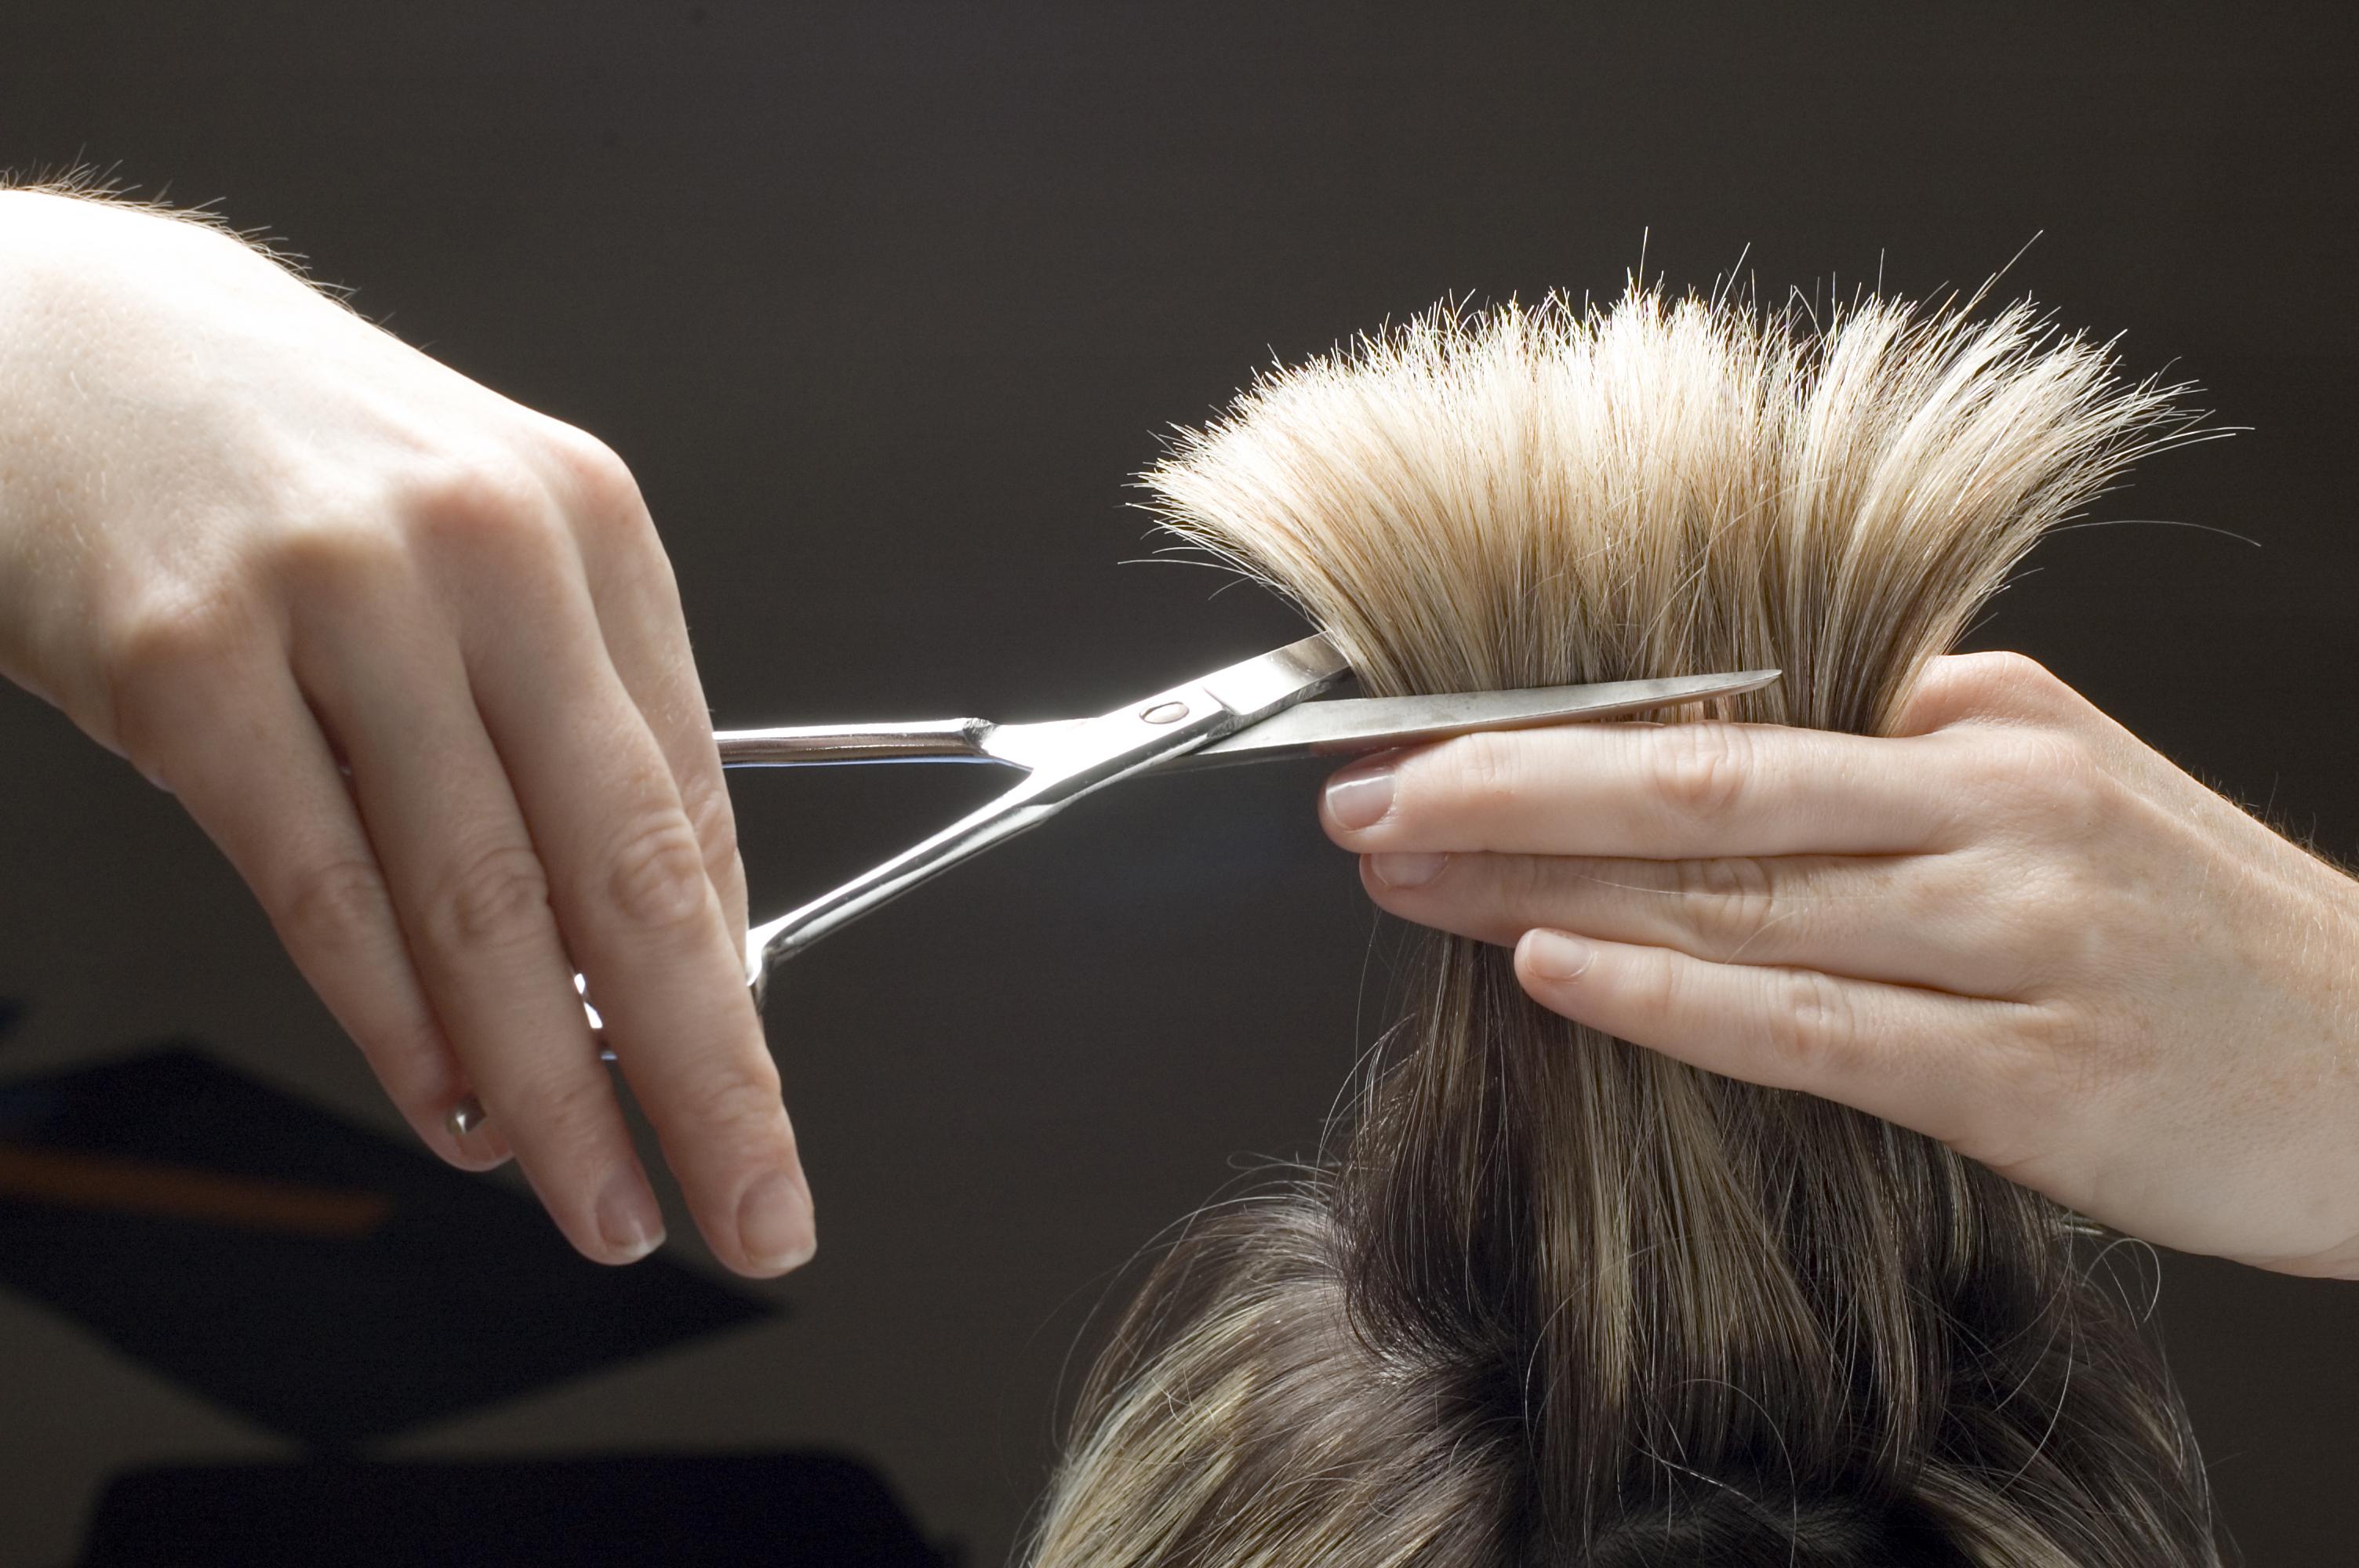 Бизнес для женщин. Наращивание волос на дому.